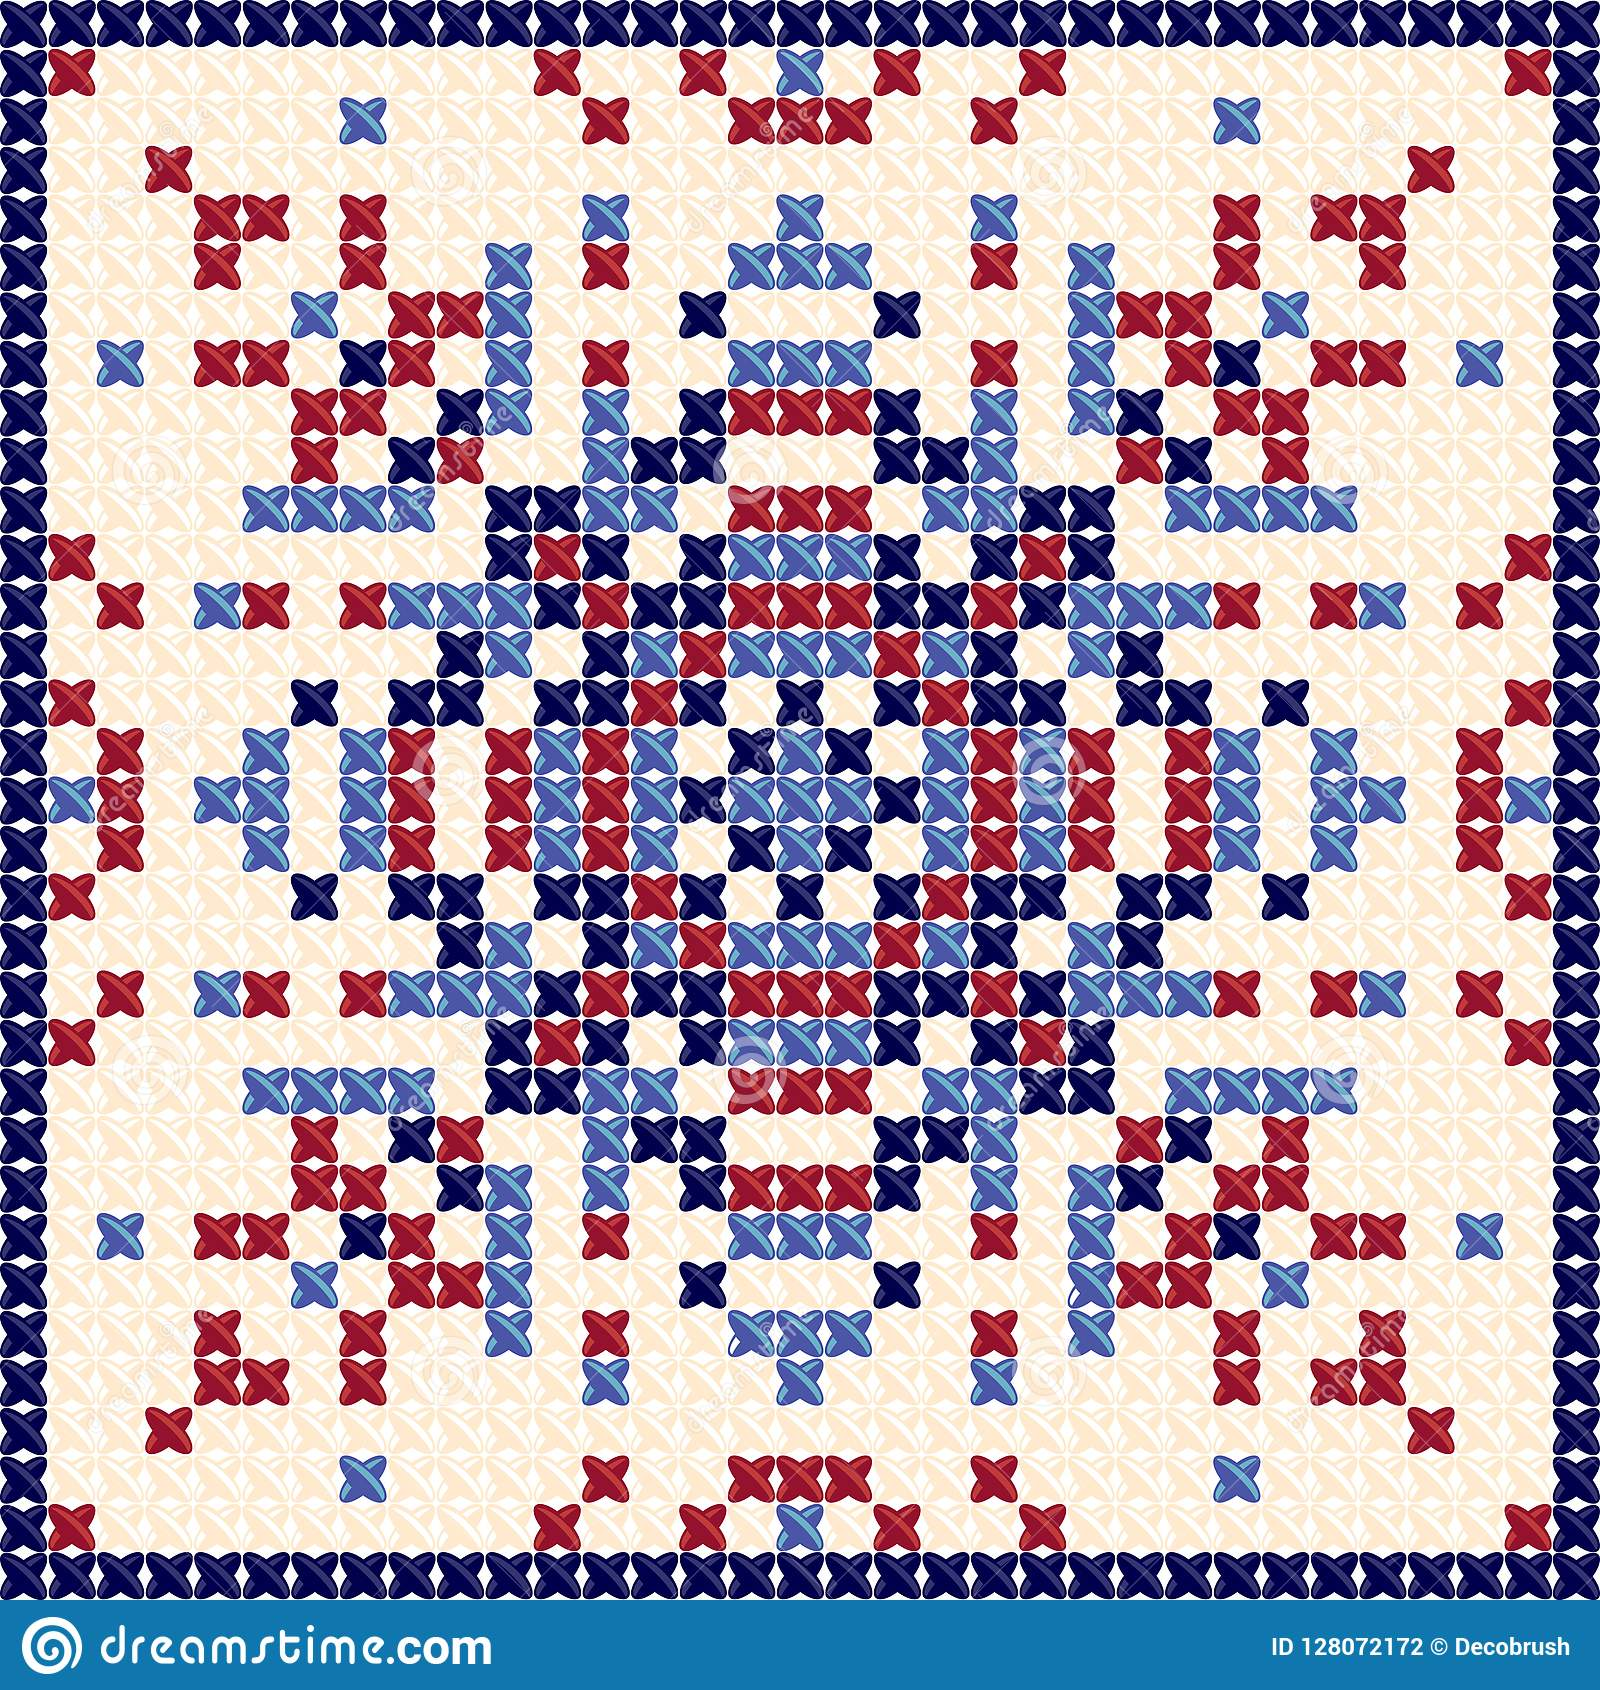 Cross Stitch Pattern Scandinavian Ornament Ethnic Background Cushion Stock Illustration Illustration Of Mosaic Pastel 128072172